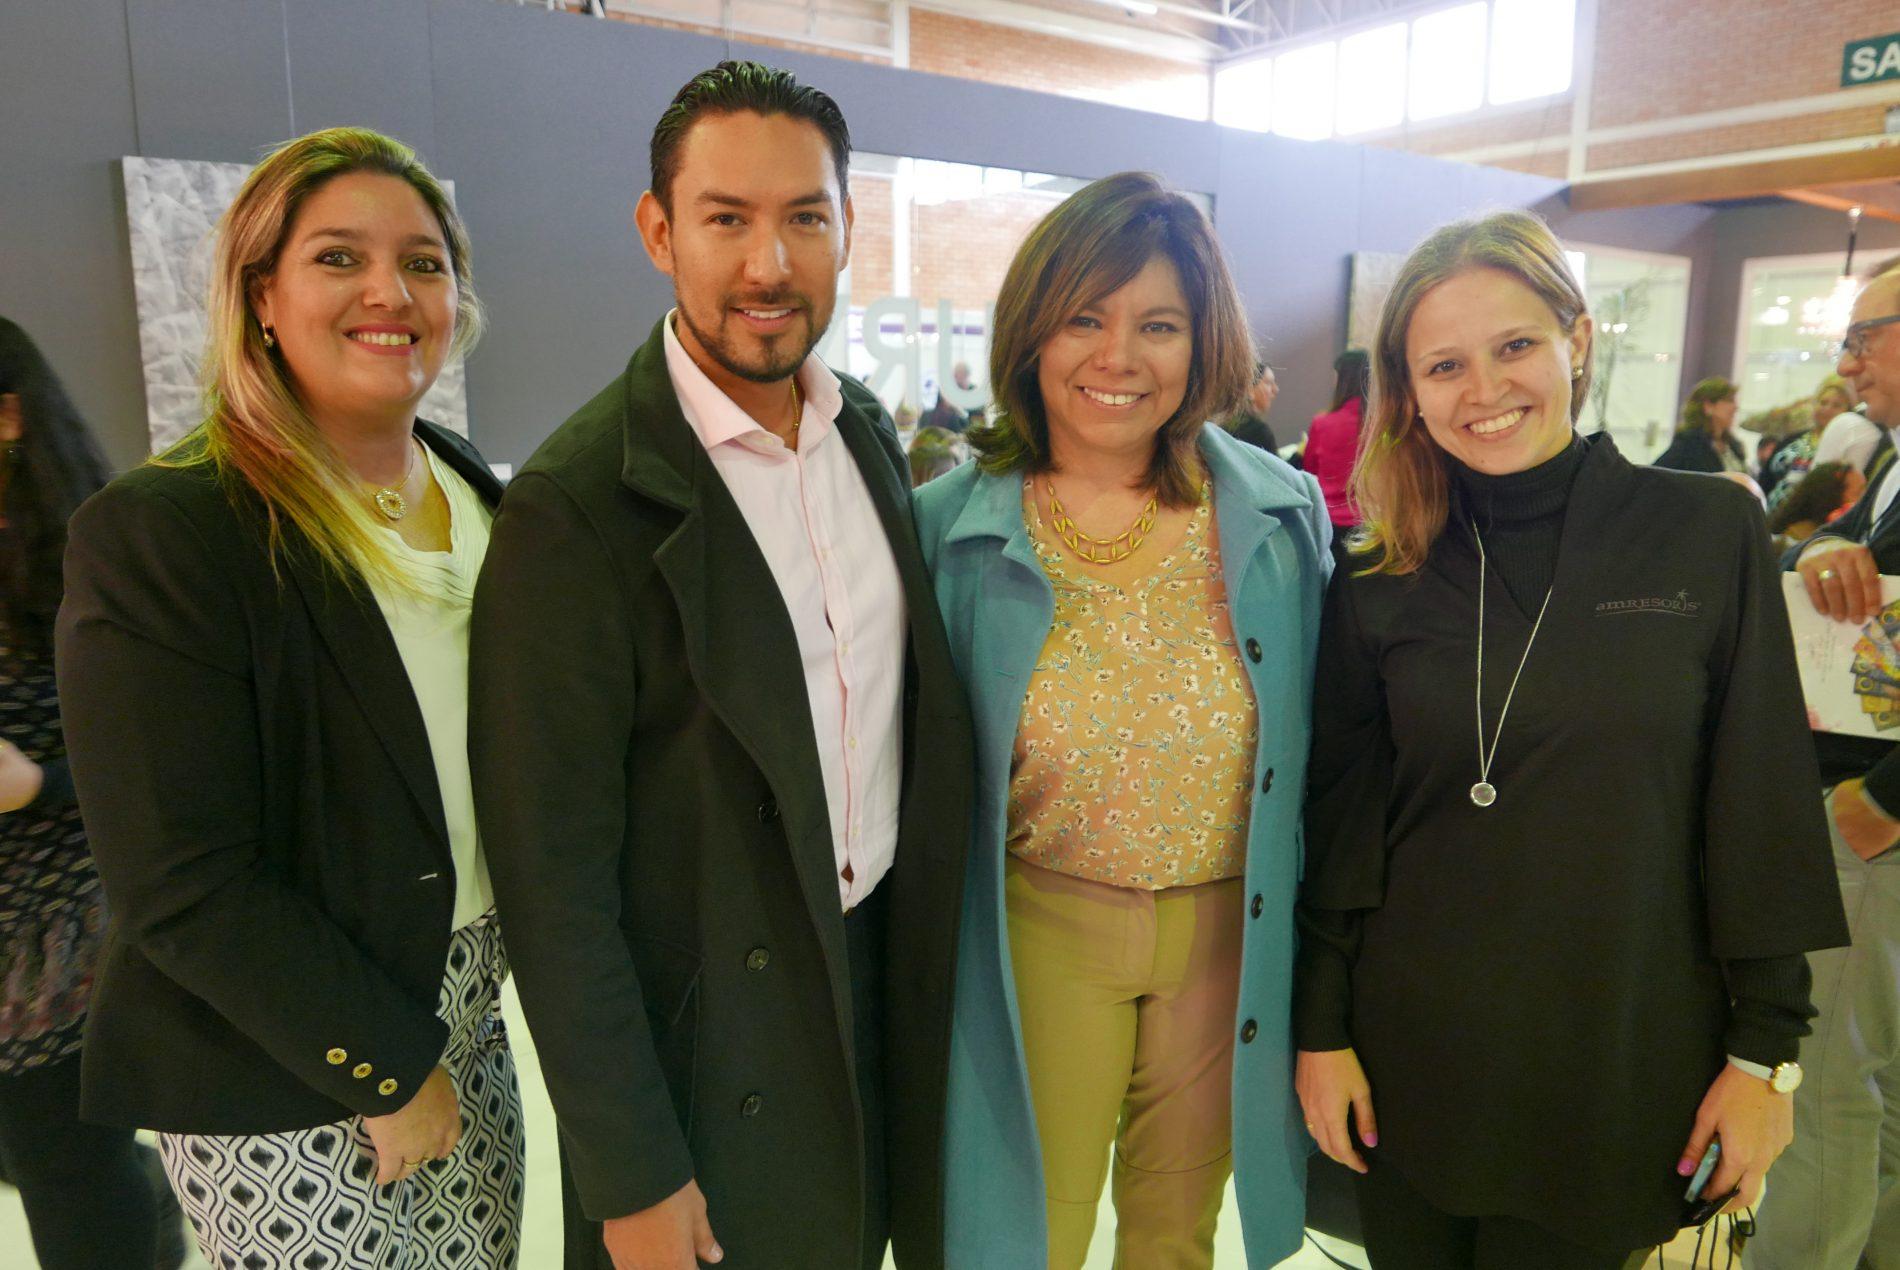 Carla Cecchele e Leonel Reyes, da RCD Hotels; Diana Pomar, do CPTM, e Flávia Fernandes, da AMResorts